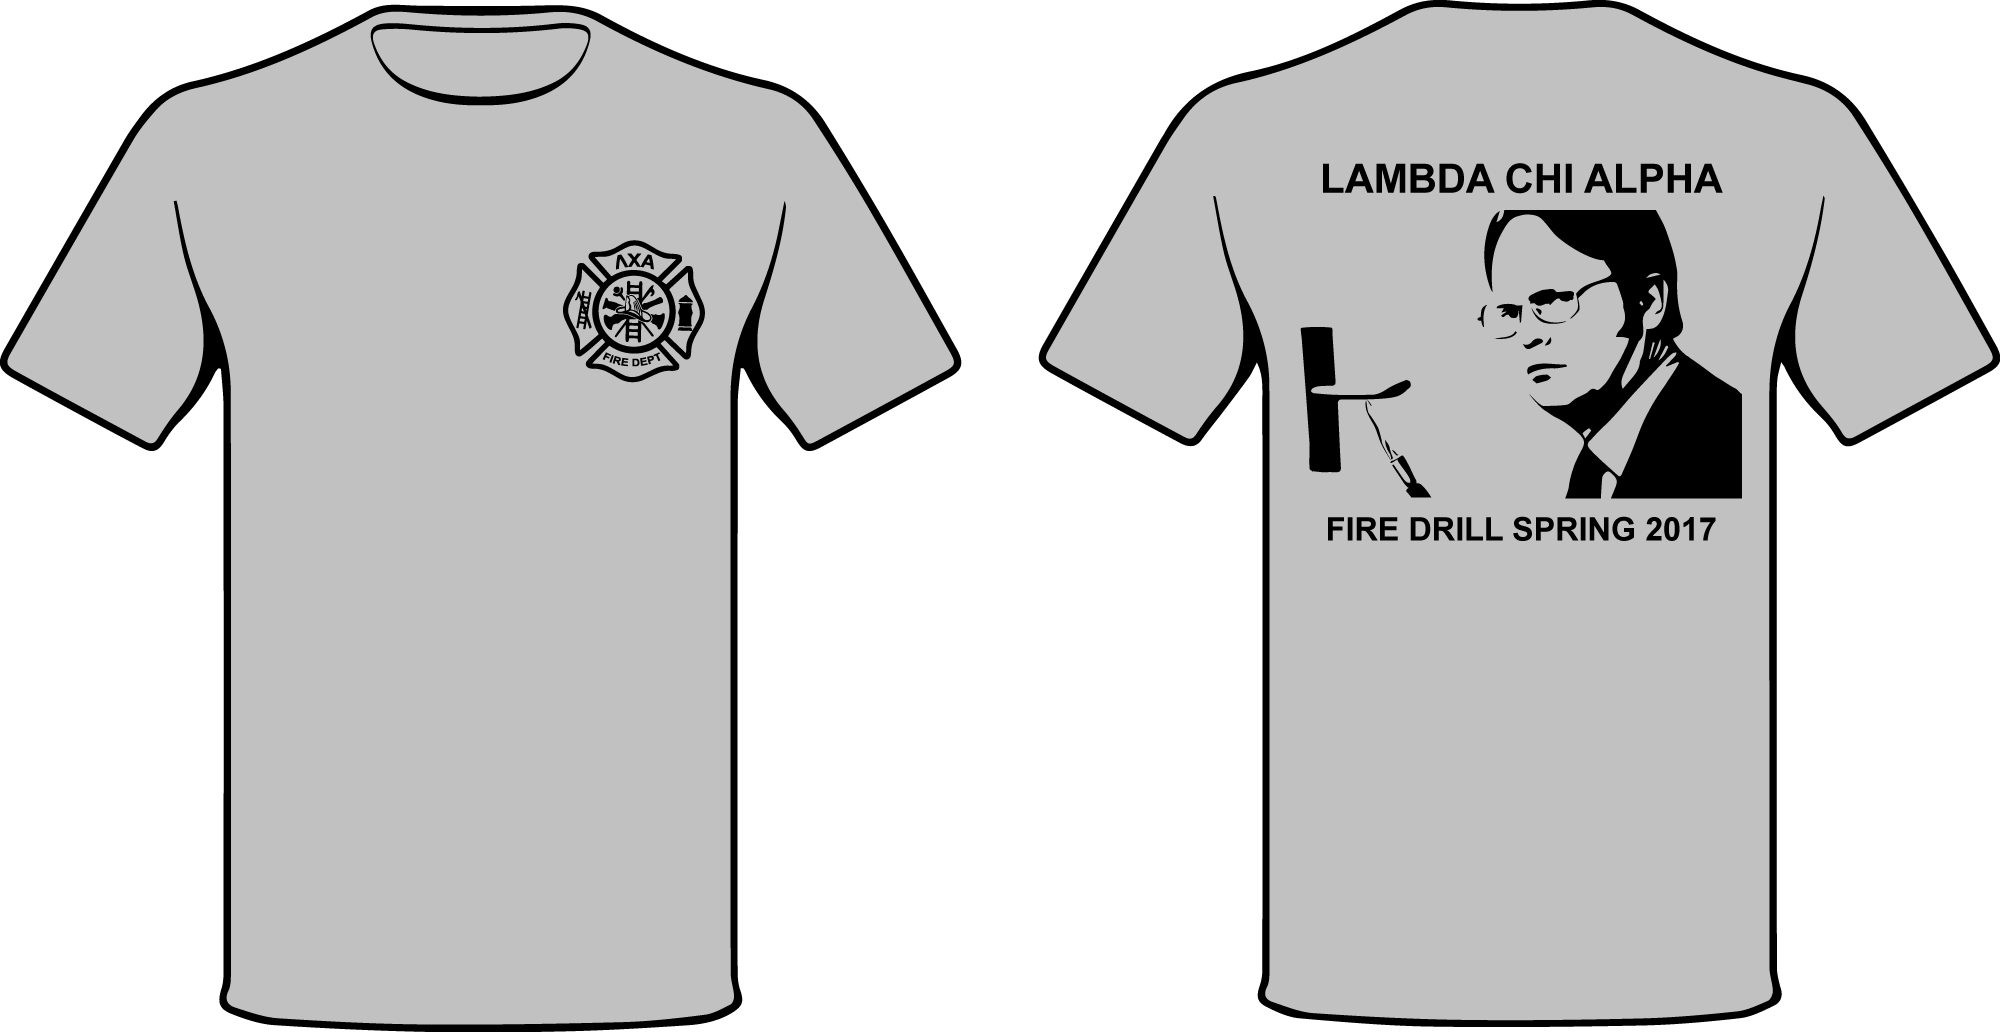 Lambda Chi Alpha Fraternity - 2017